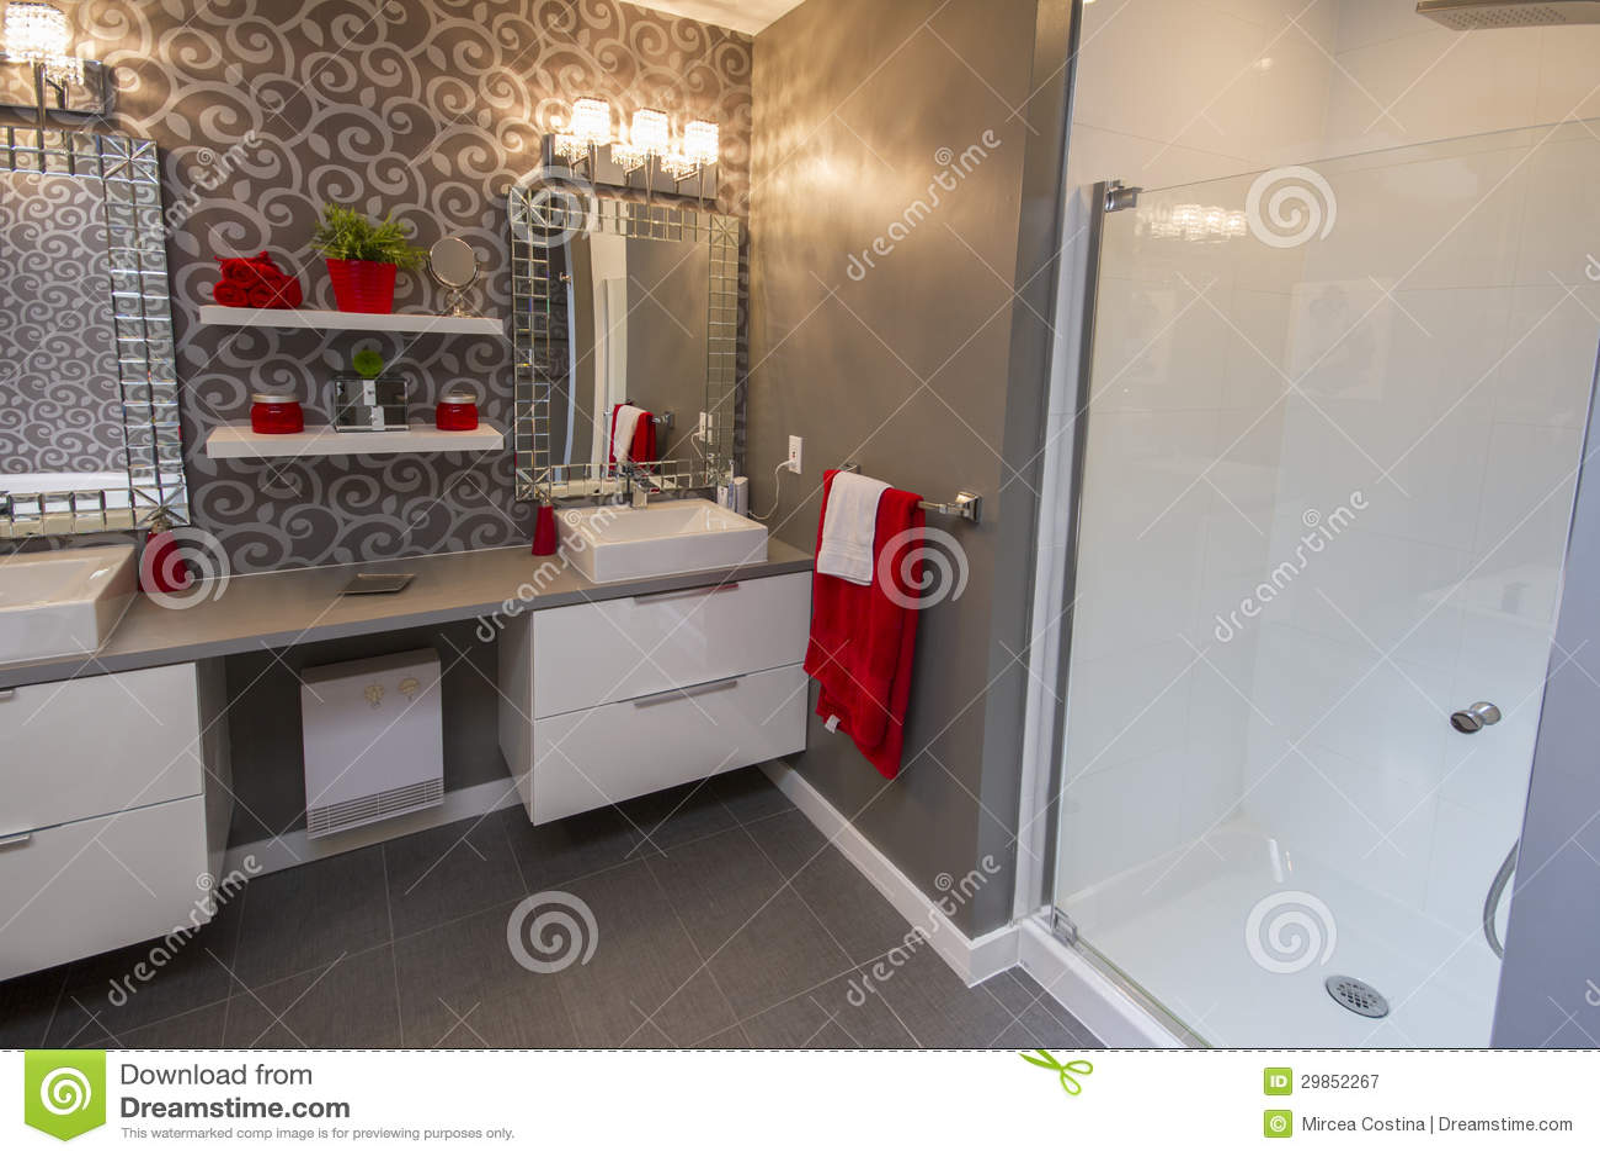 Bathroom royalty free stock photography image 29852267